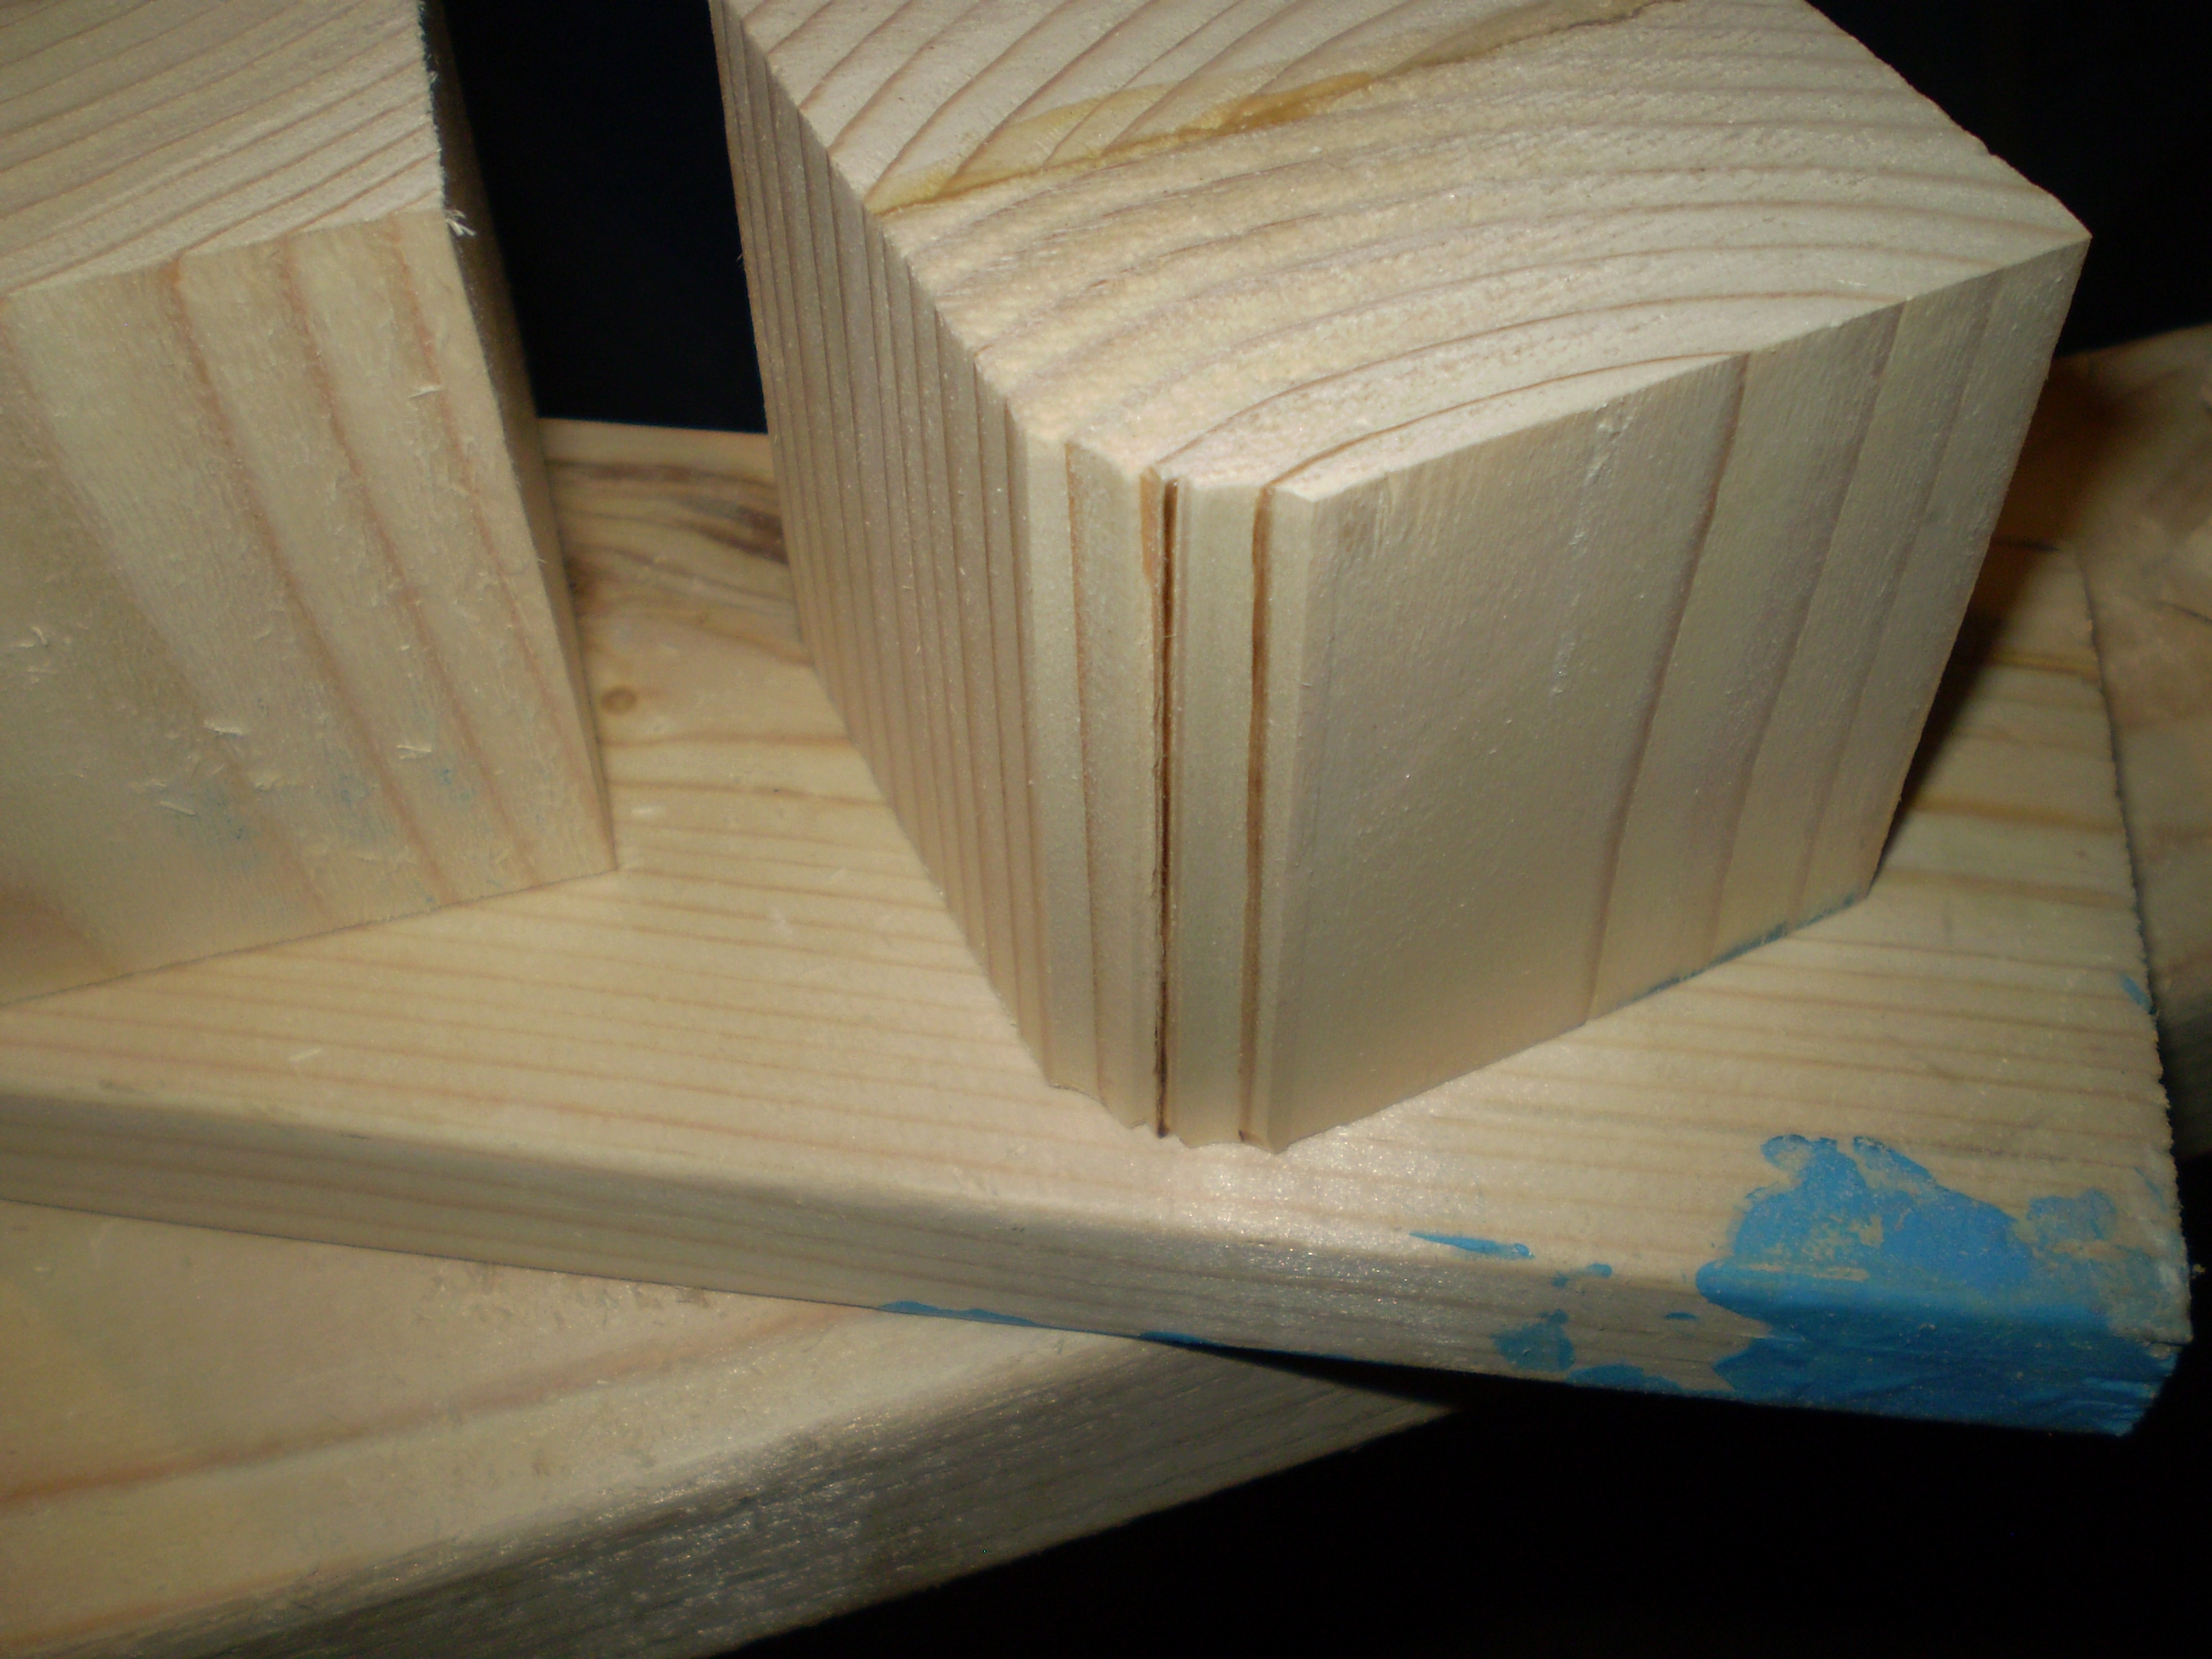 Picture of Finishing Corner Blocks